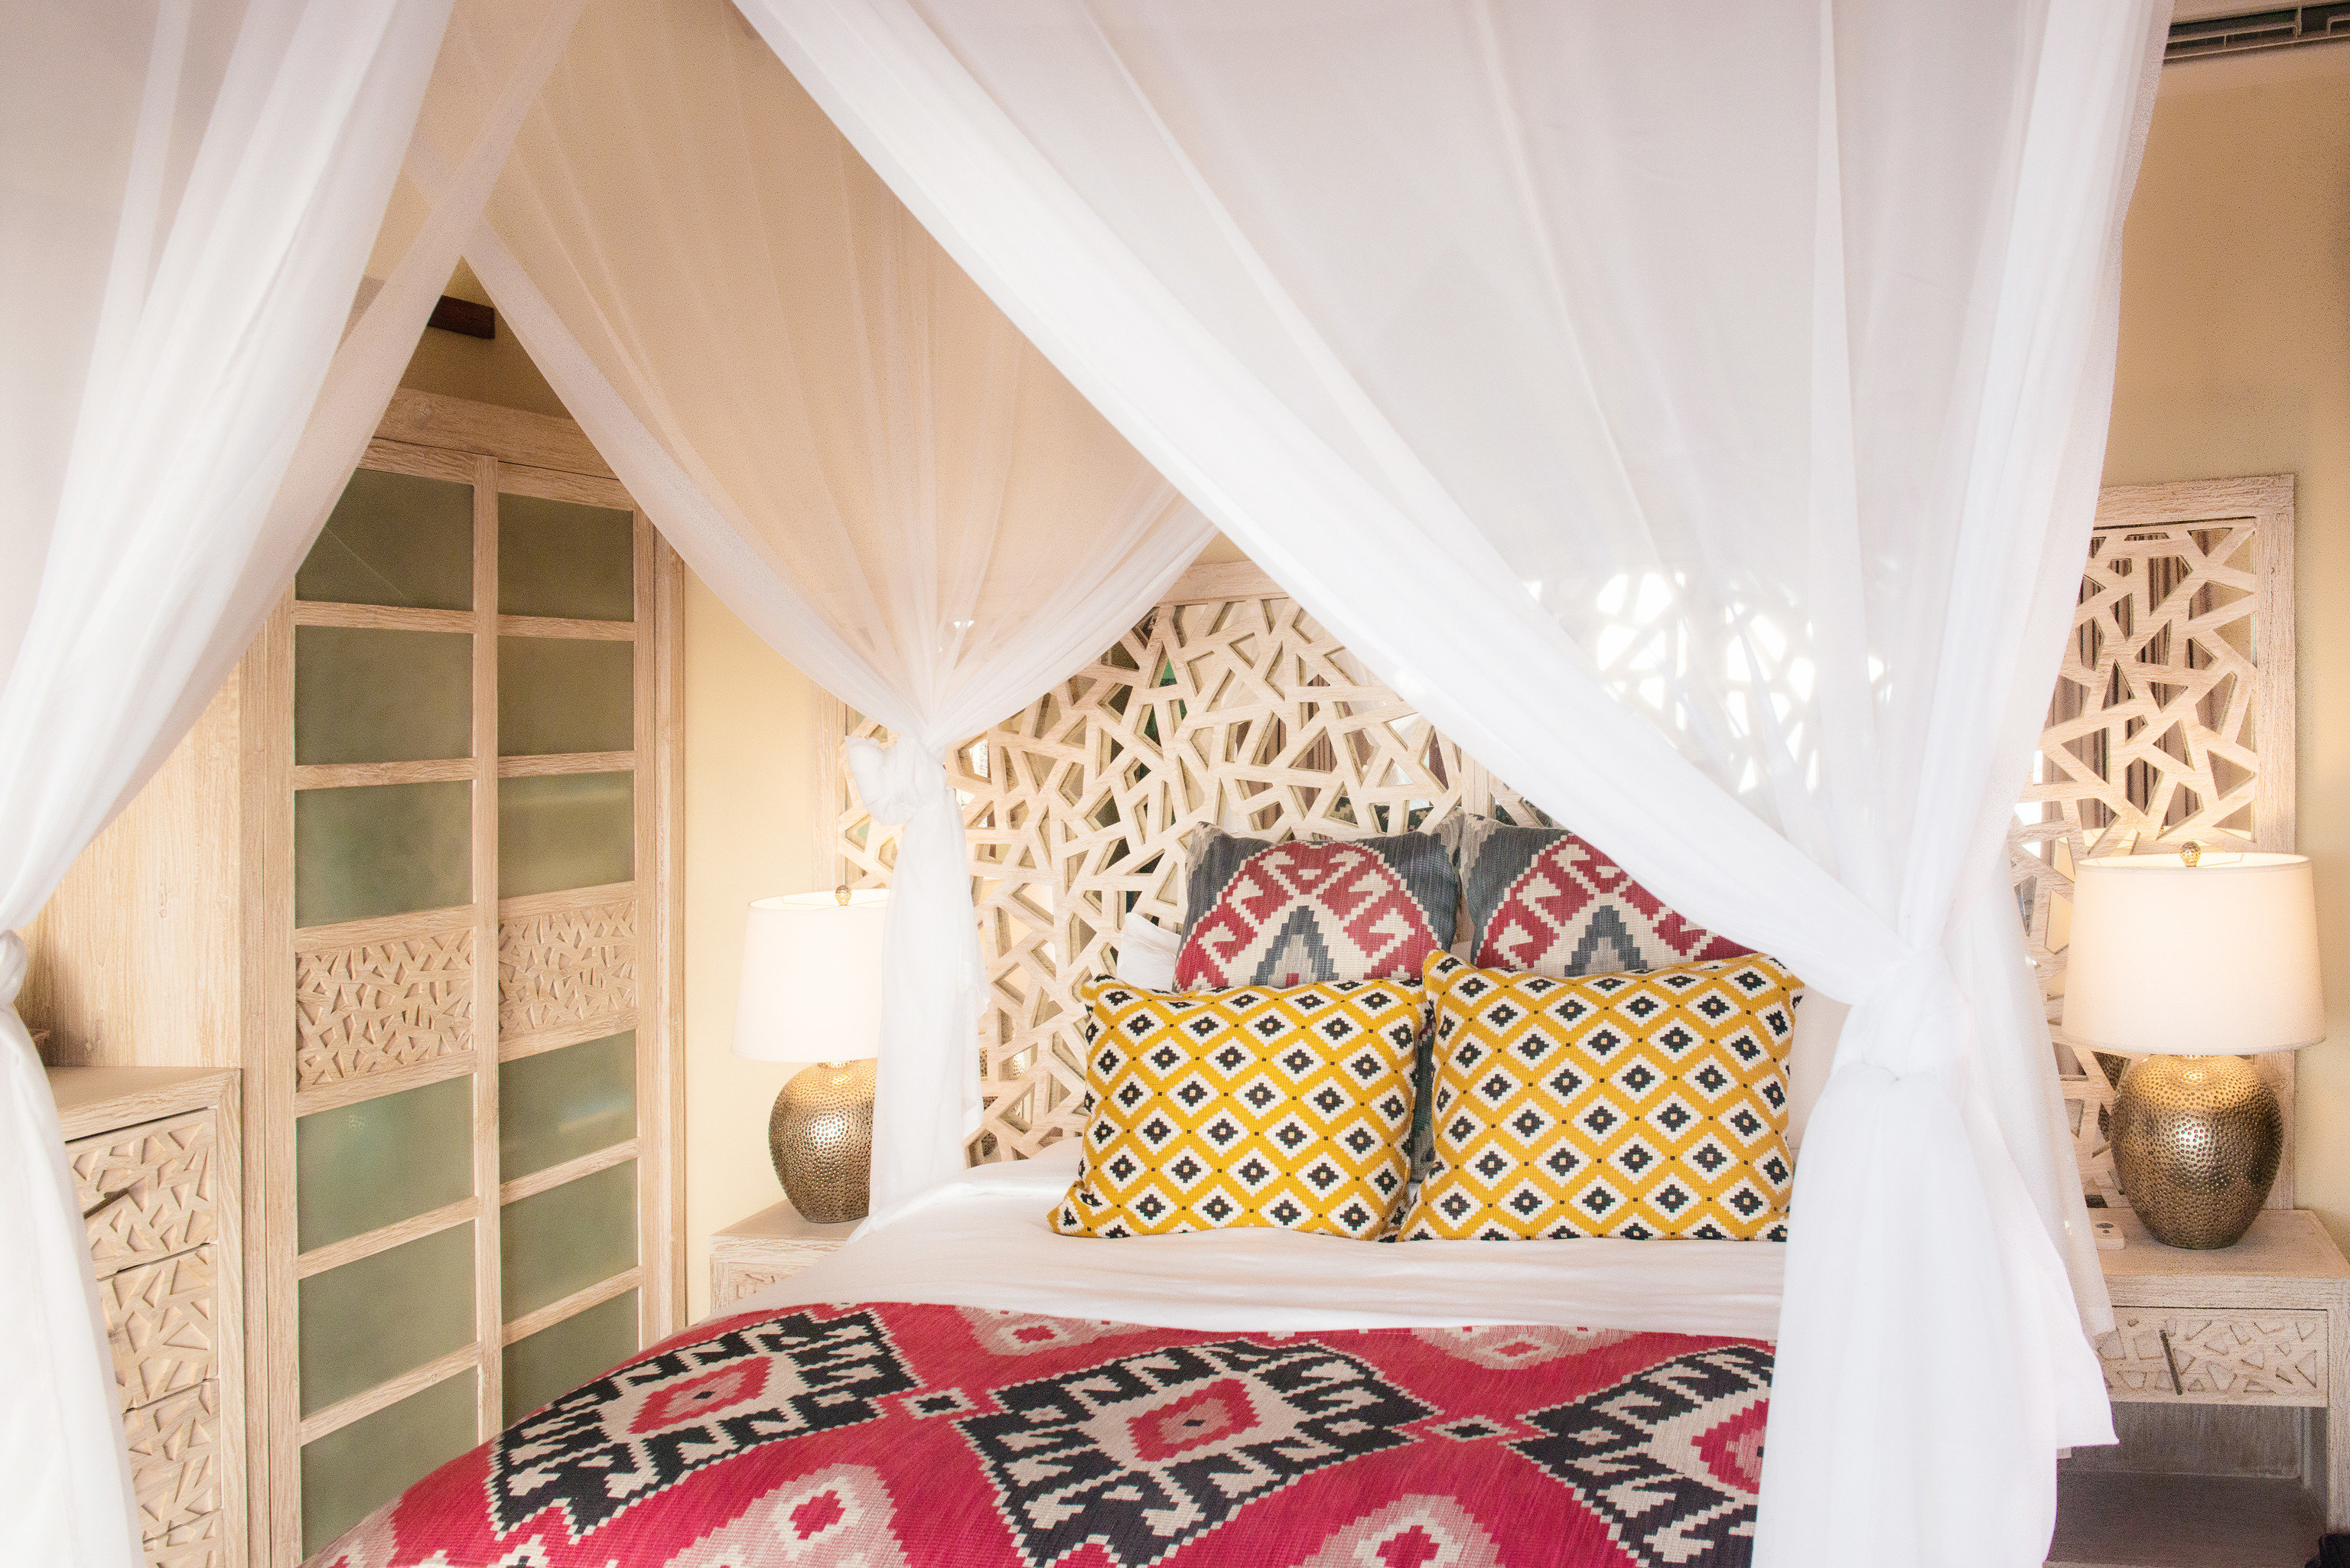 Hotels indoor room curtain Bedroom interior design bed sheet textile Design cottage decorated